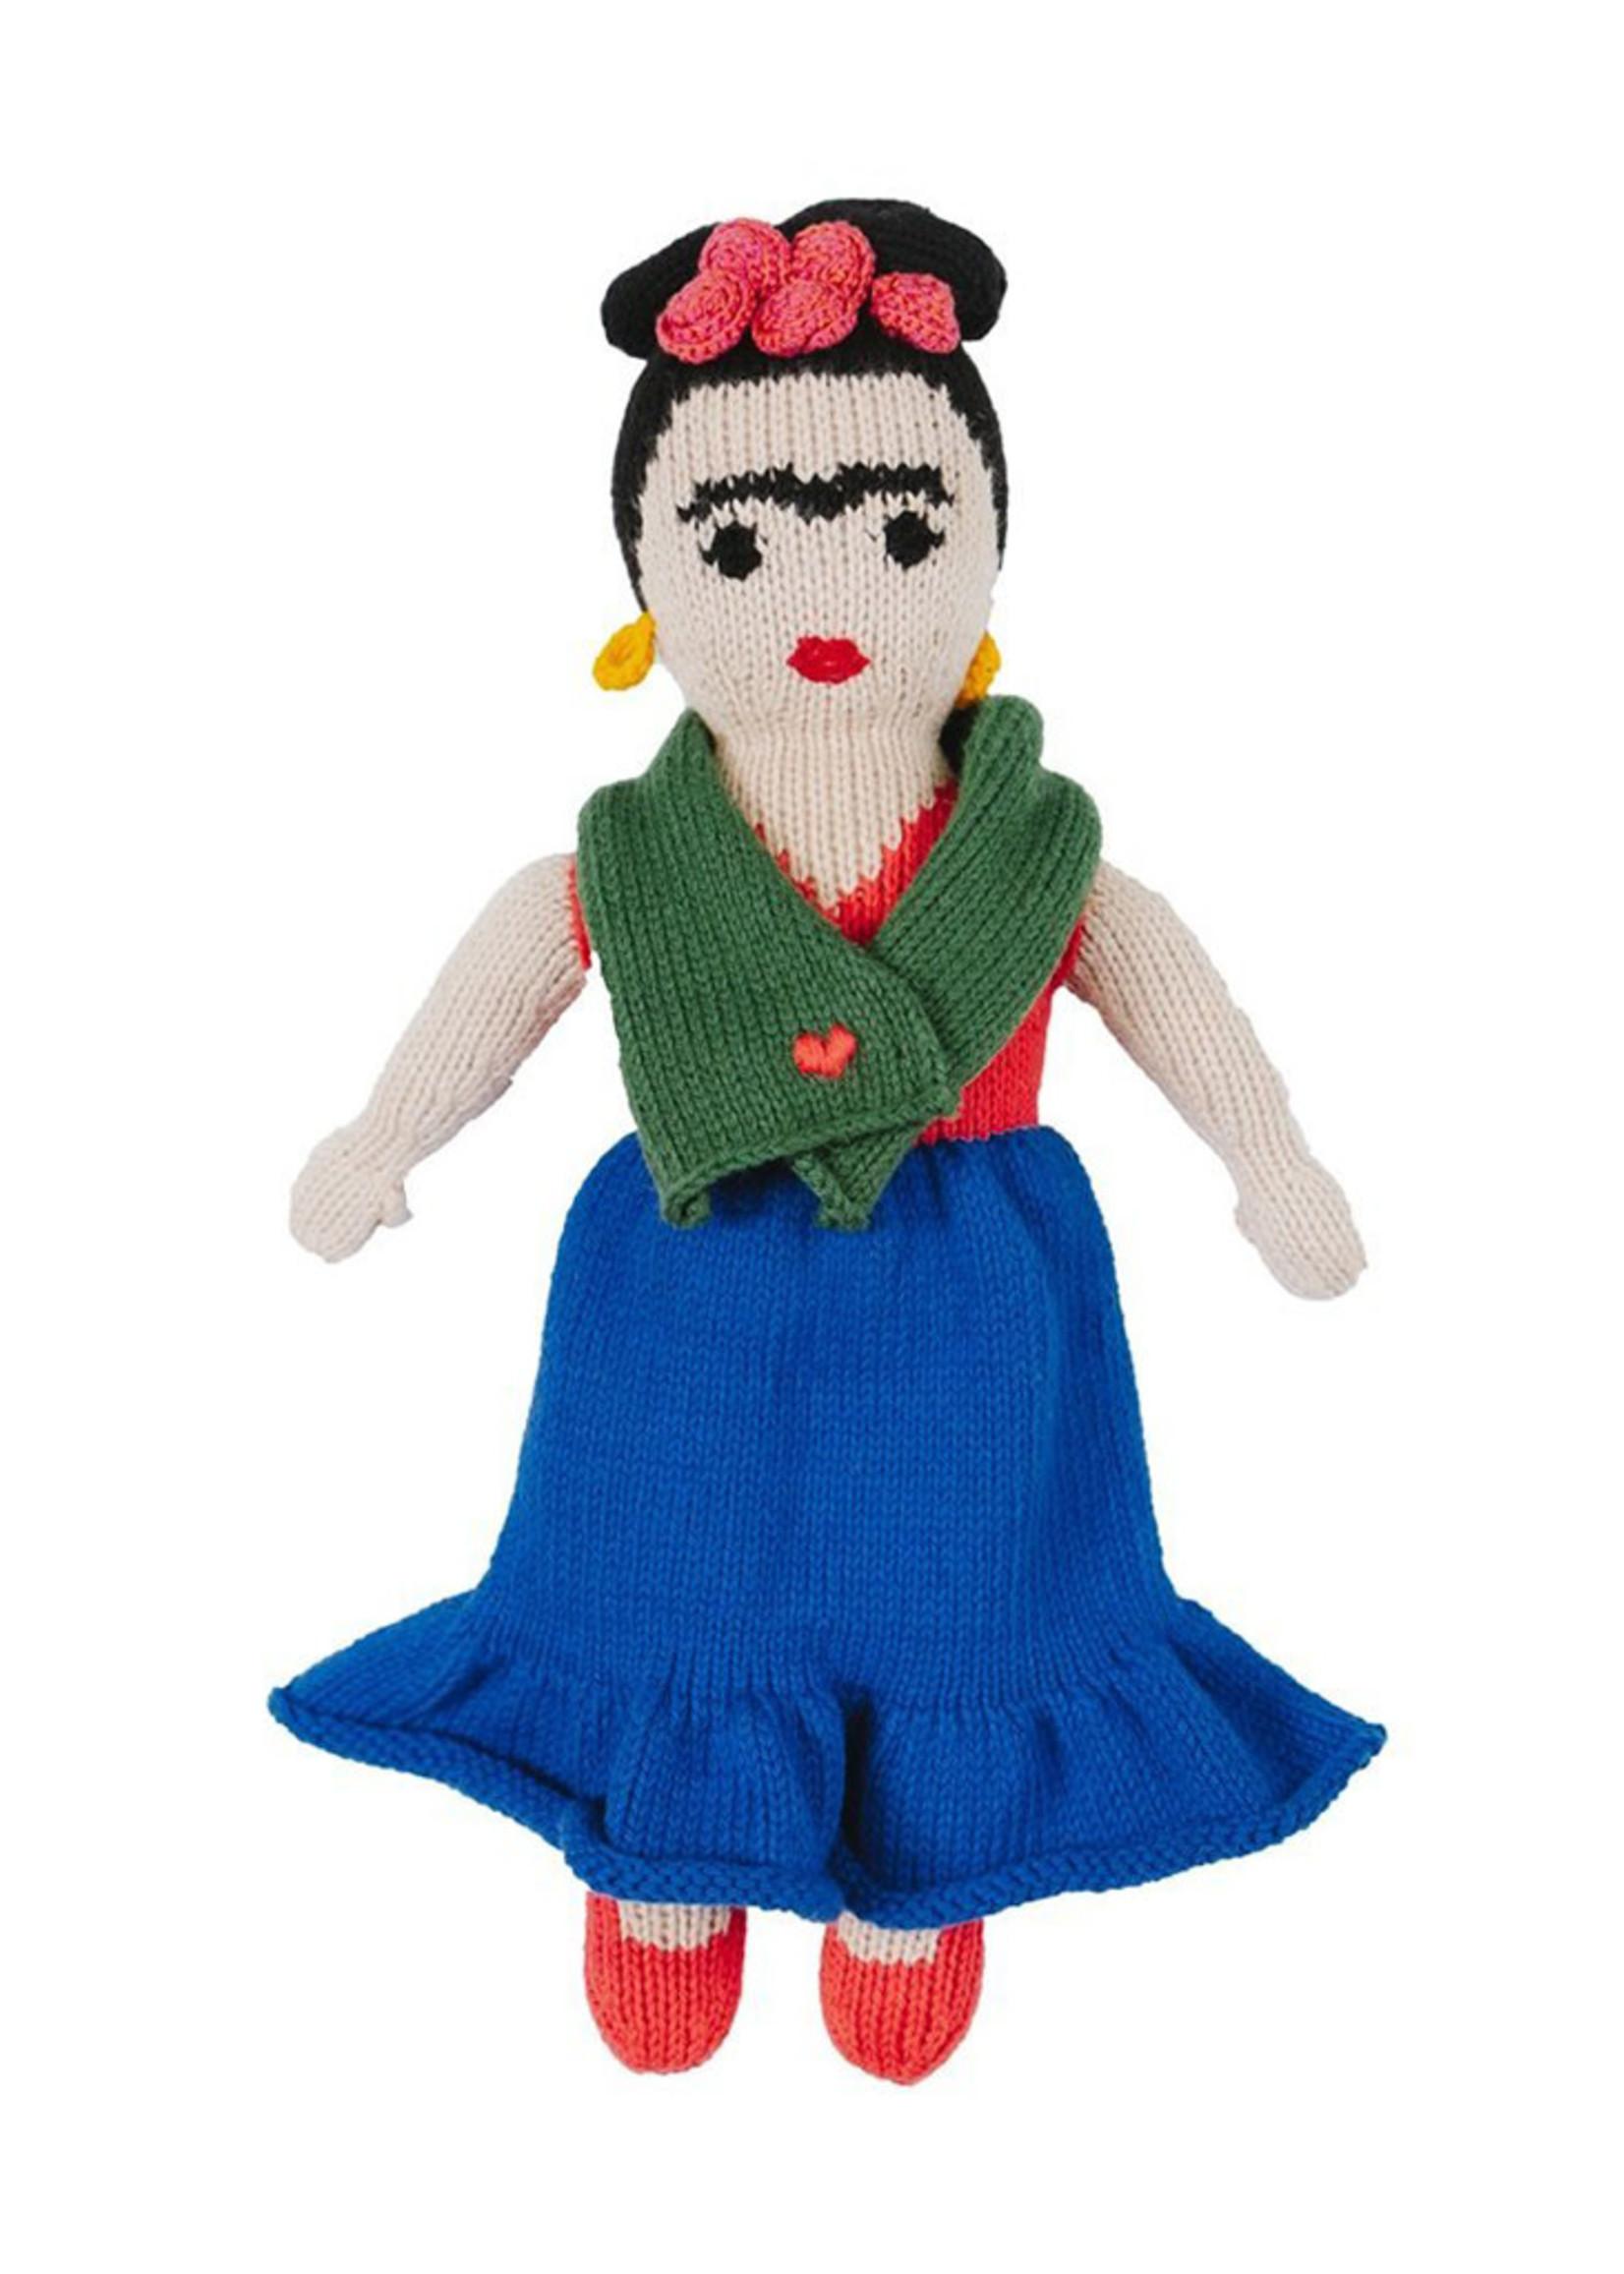 Global Goods Partners Frida Kahlo Knit Toy Doll